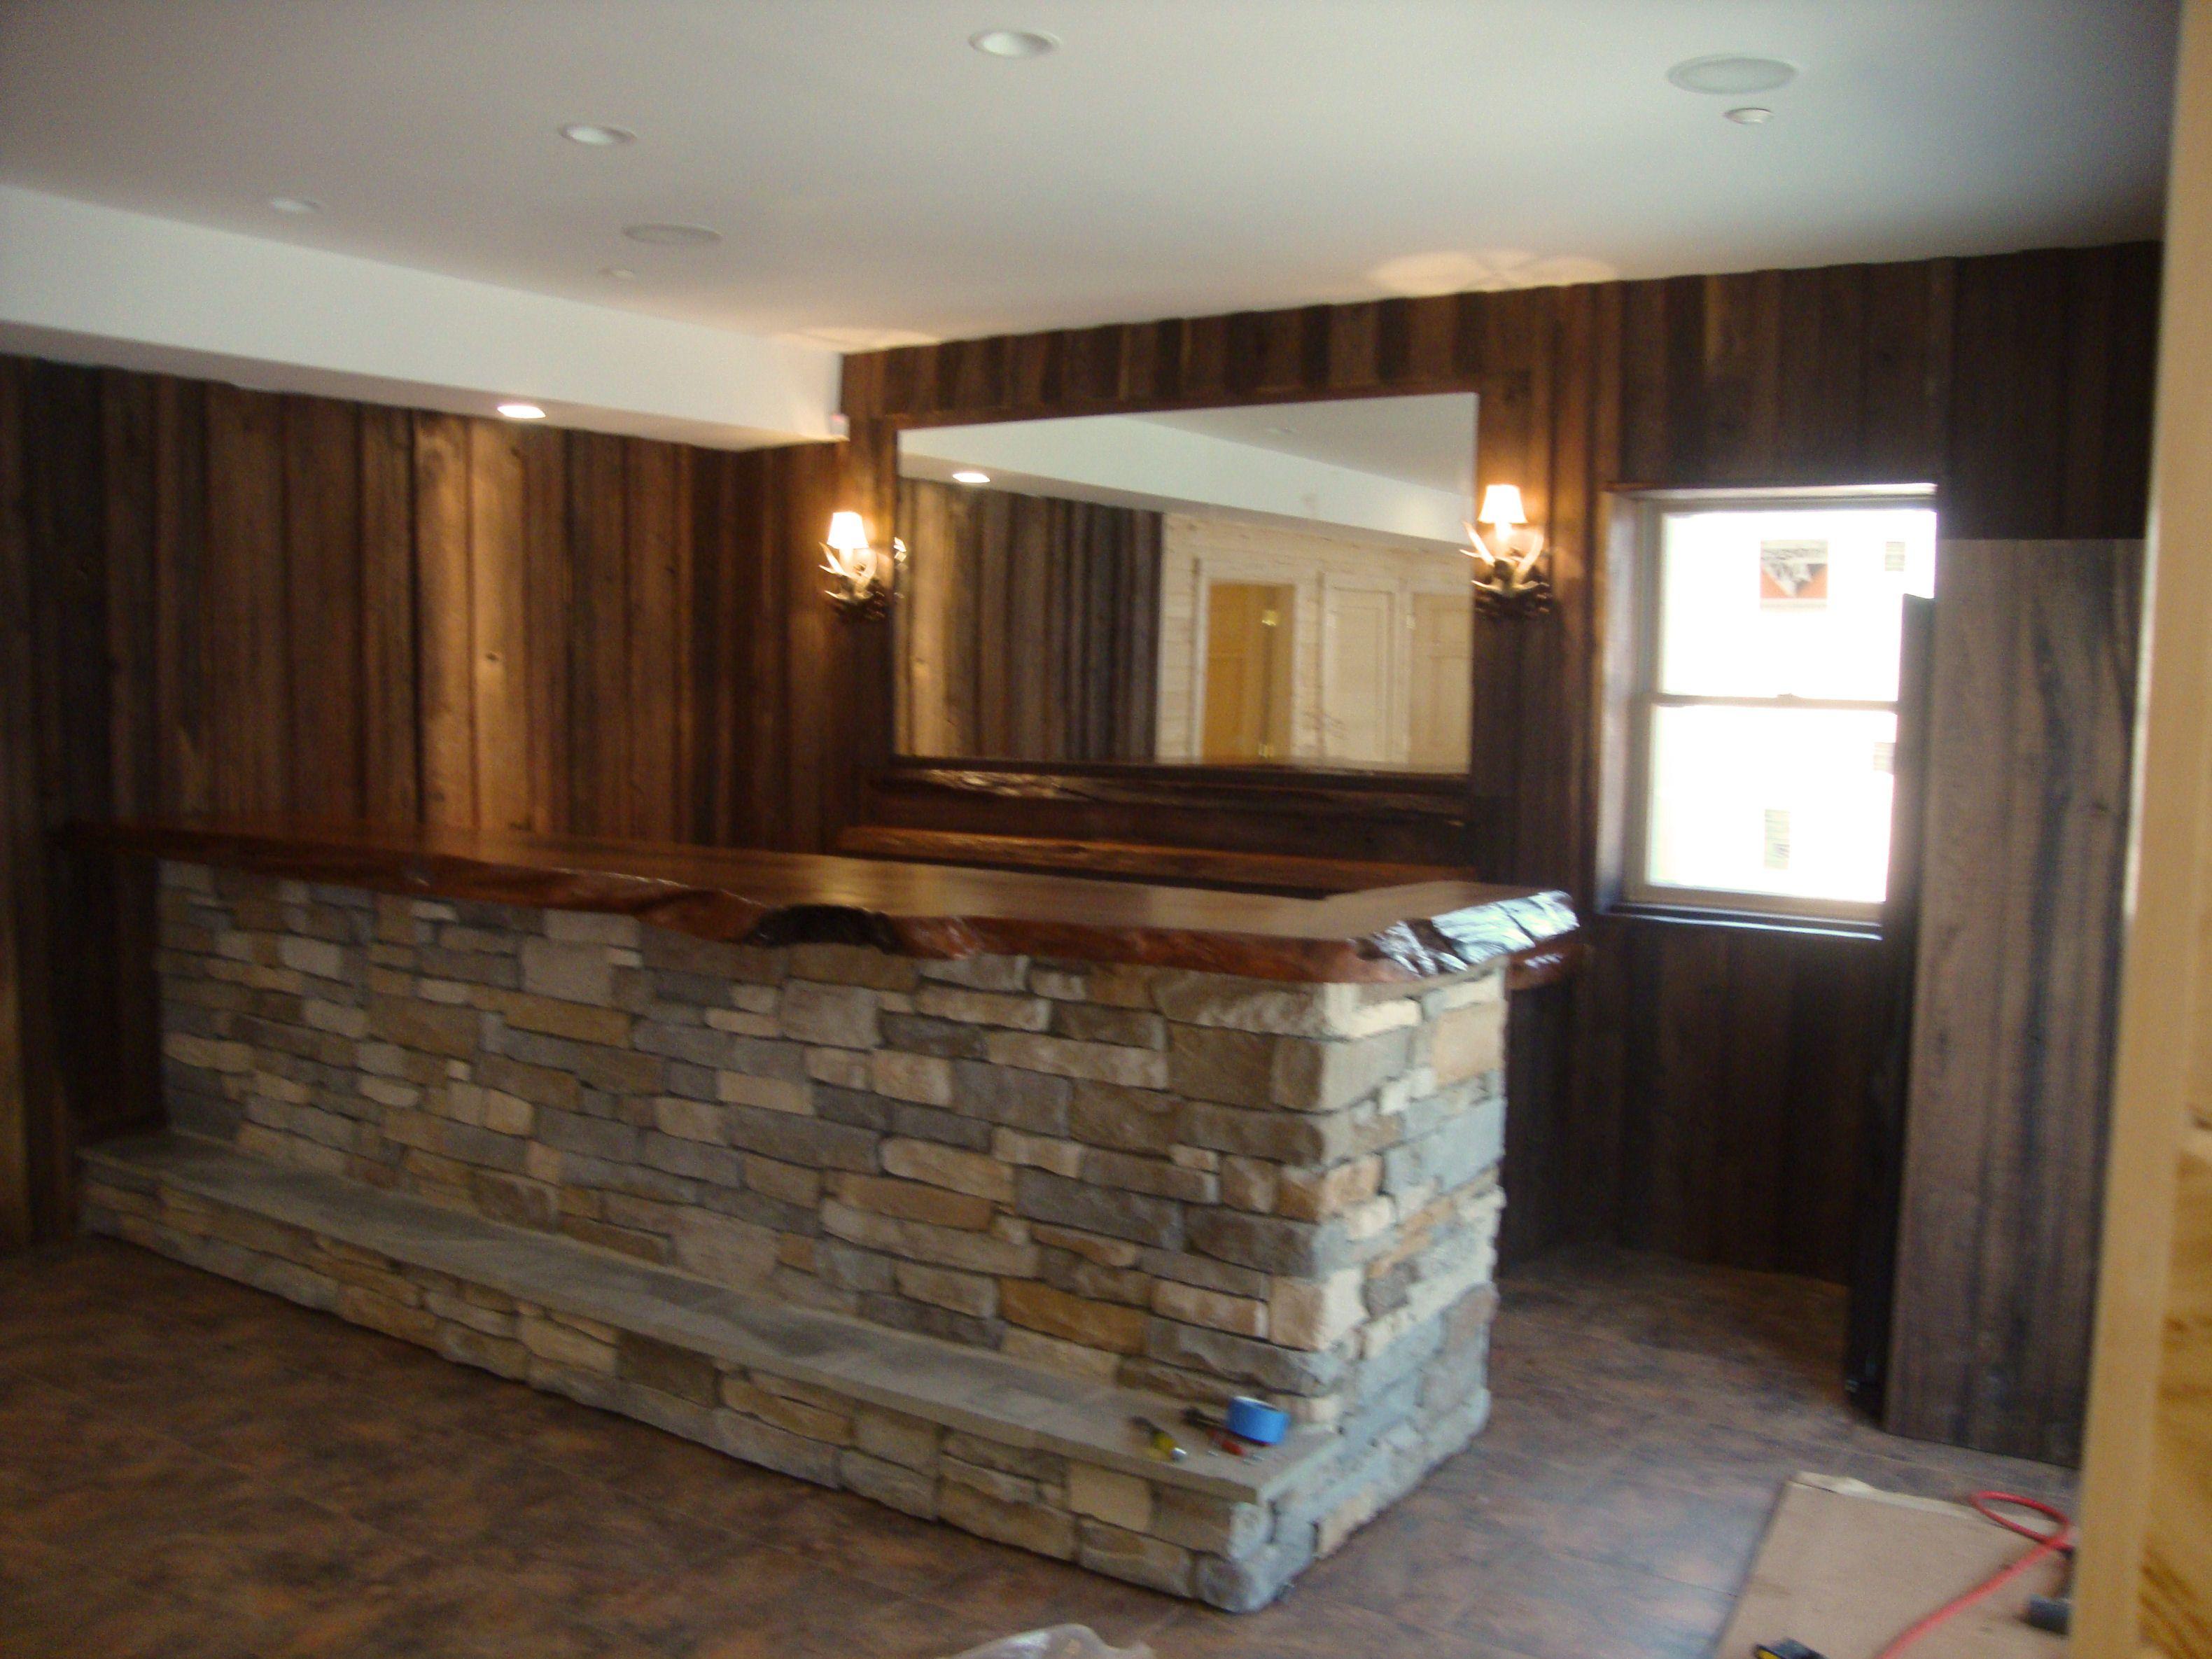 Custom Wet Bars Live Edge Wood Slabs Littlebranchfarm Rustic Bar Rustic Countertops Home Bar Designs